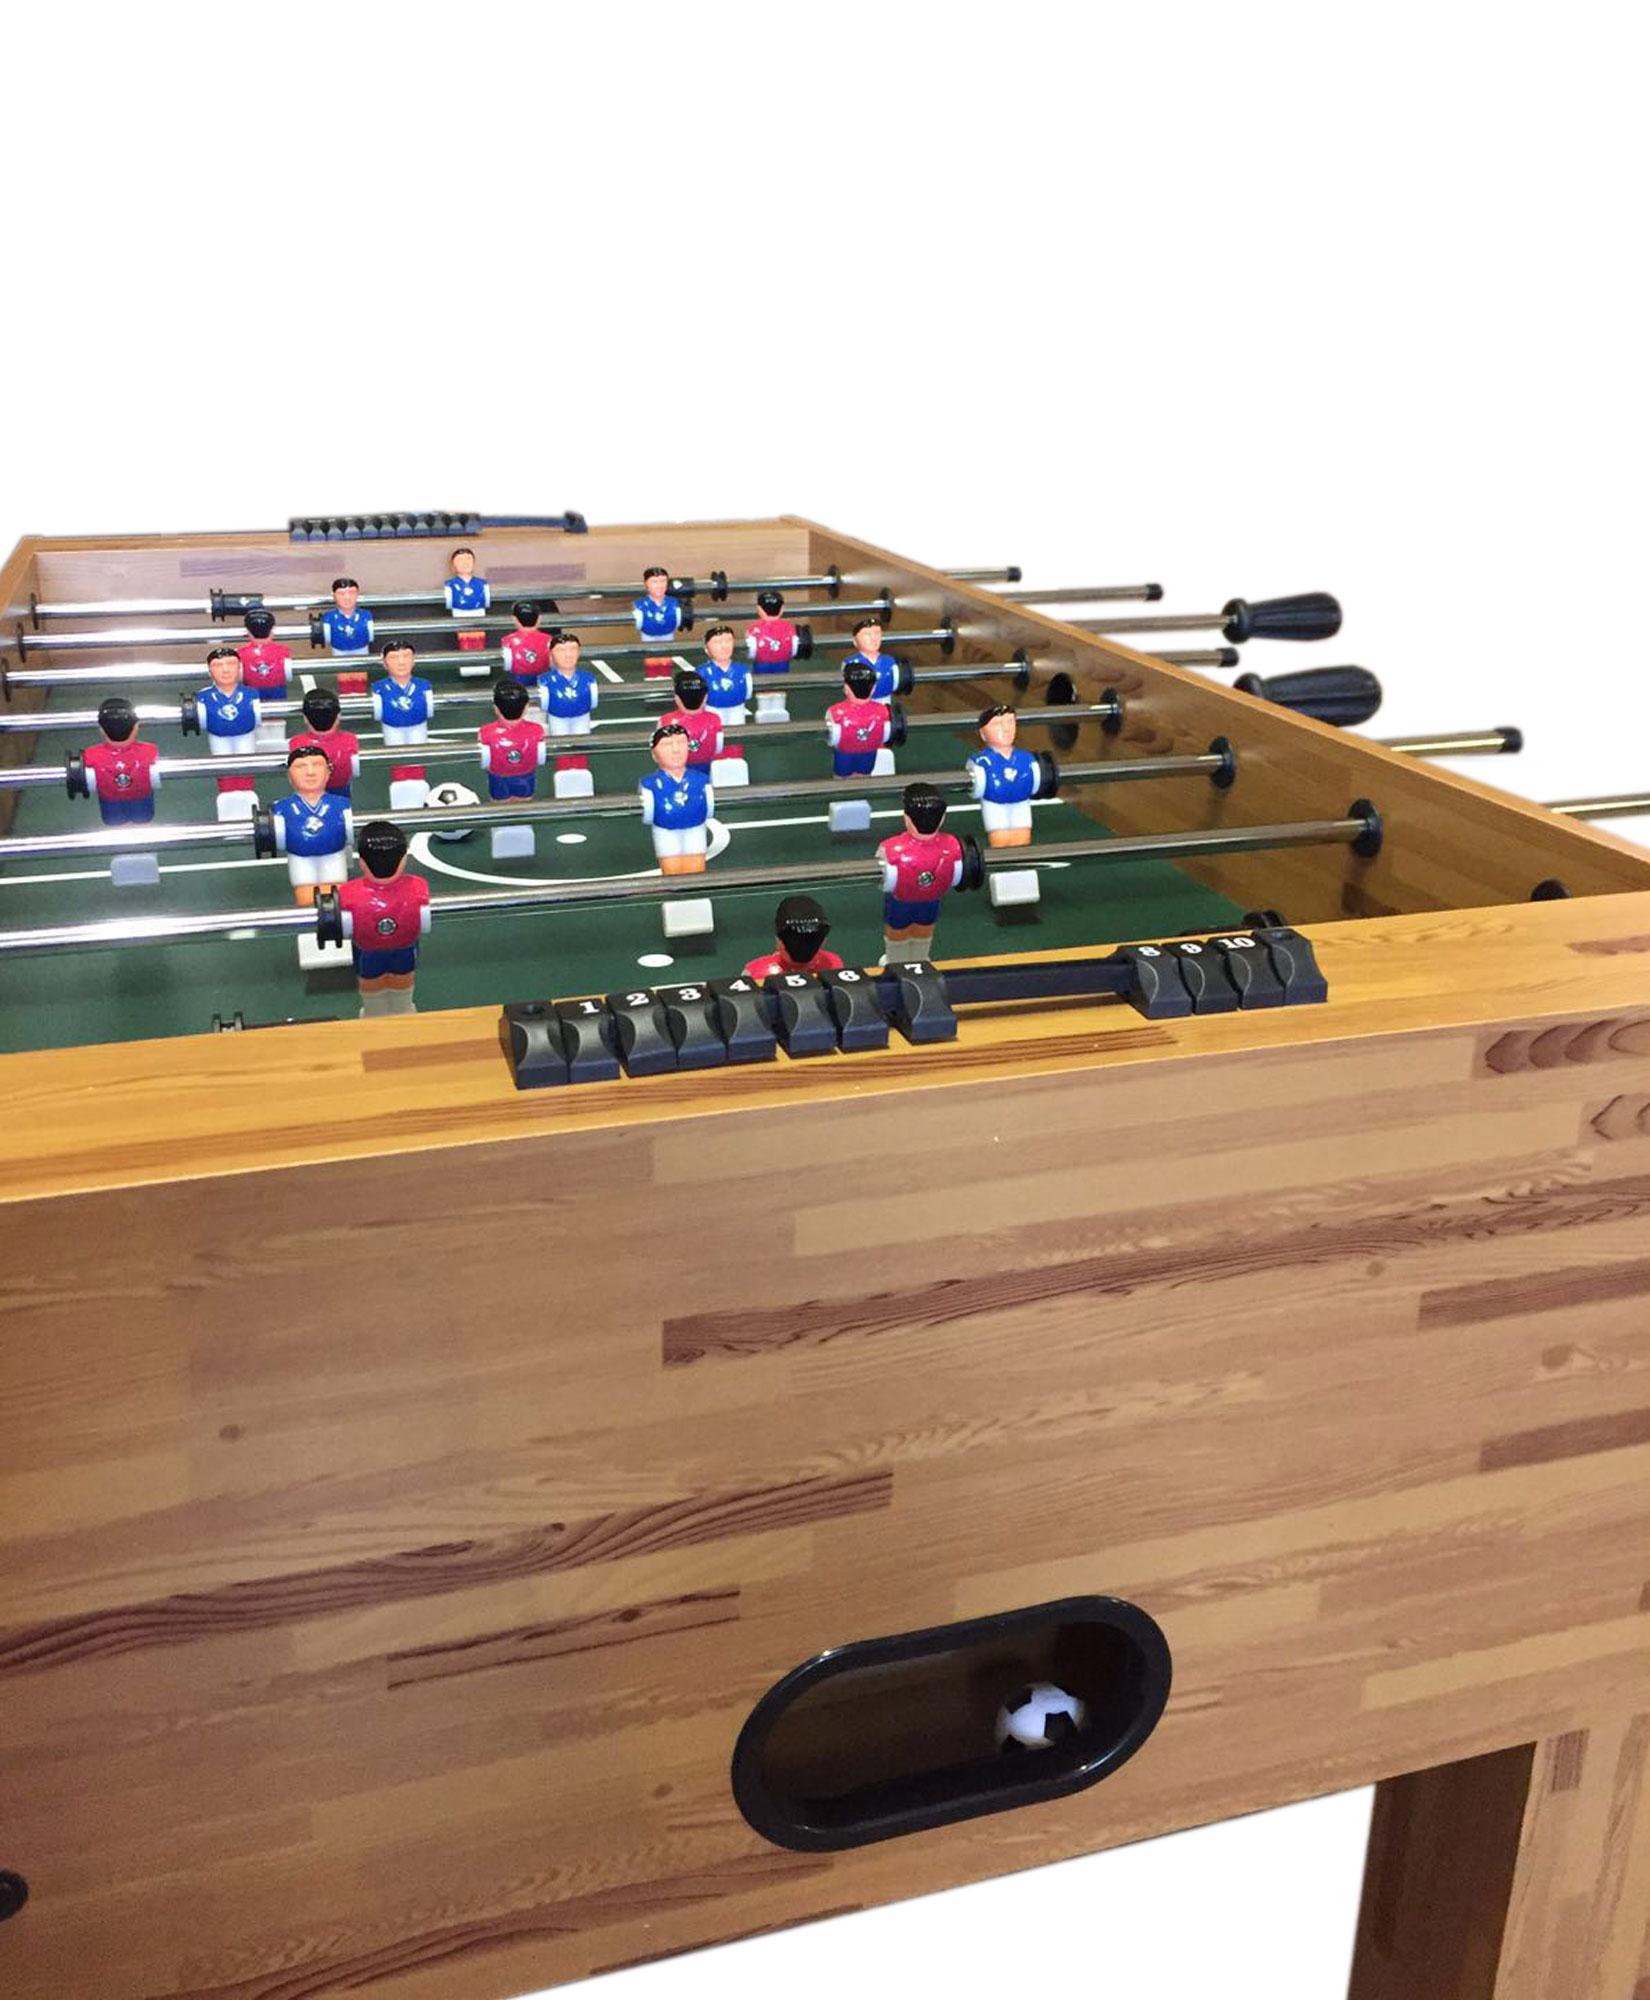 Kids Childrens Football Field 100 X 133cm: Soccer Football Fusball Play Table Wooden Table Family